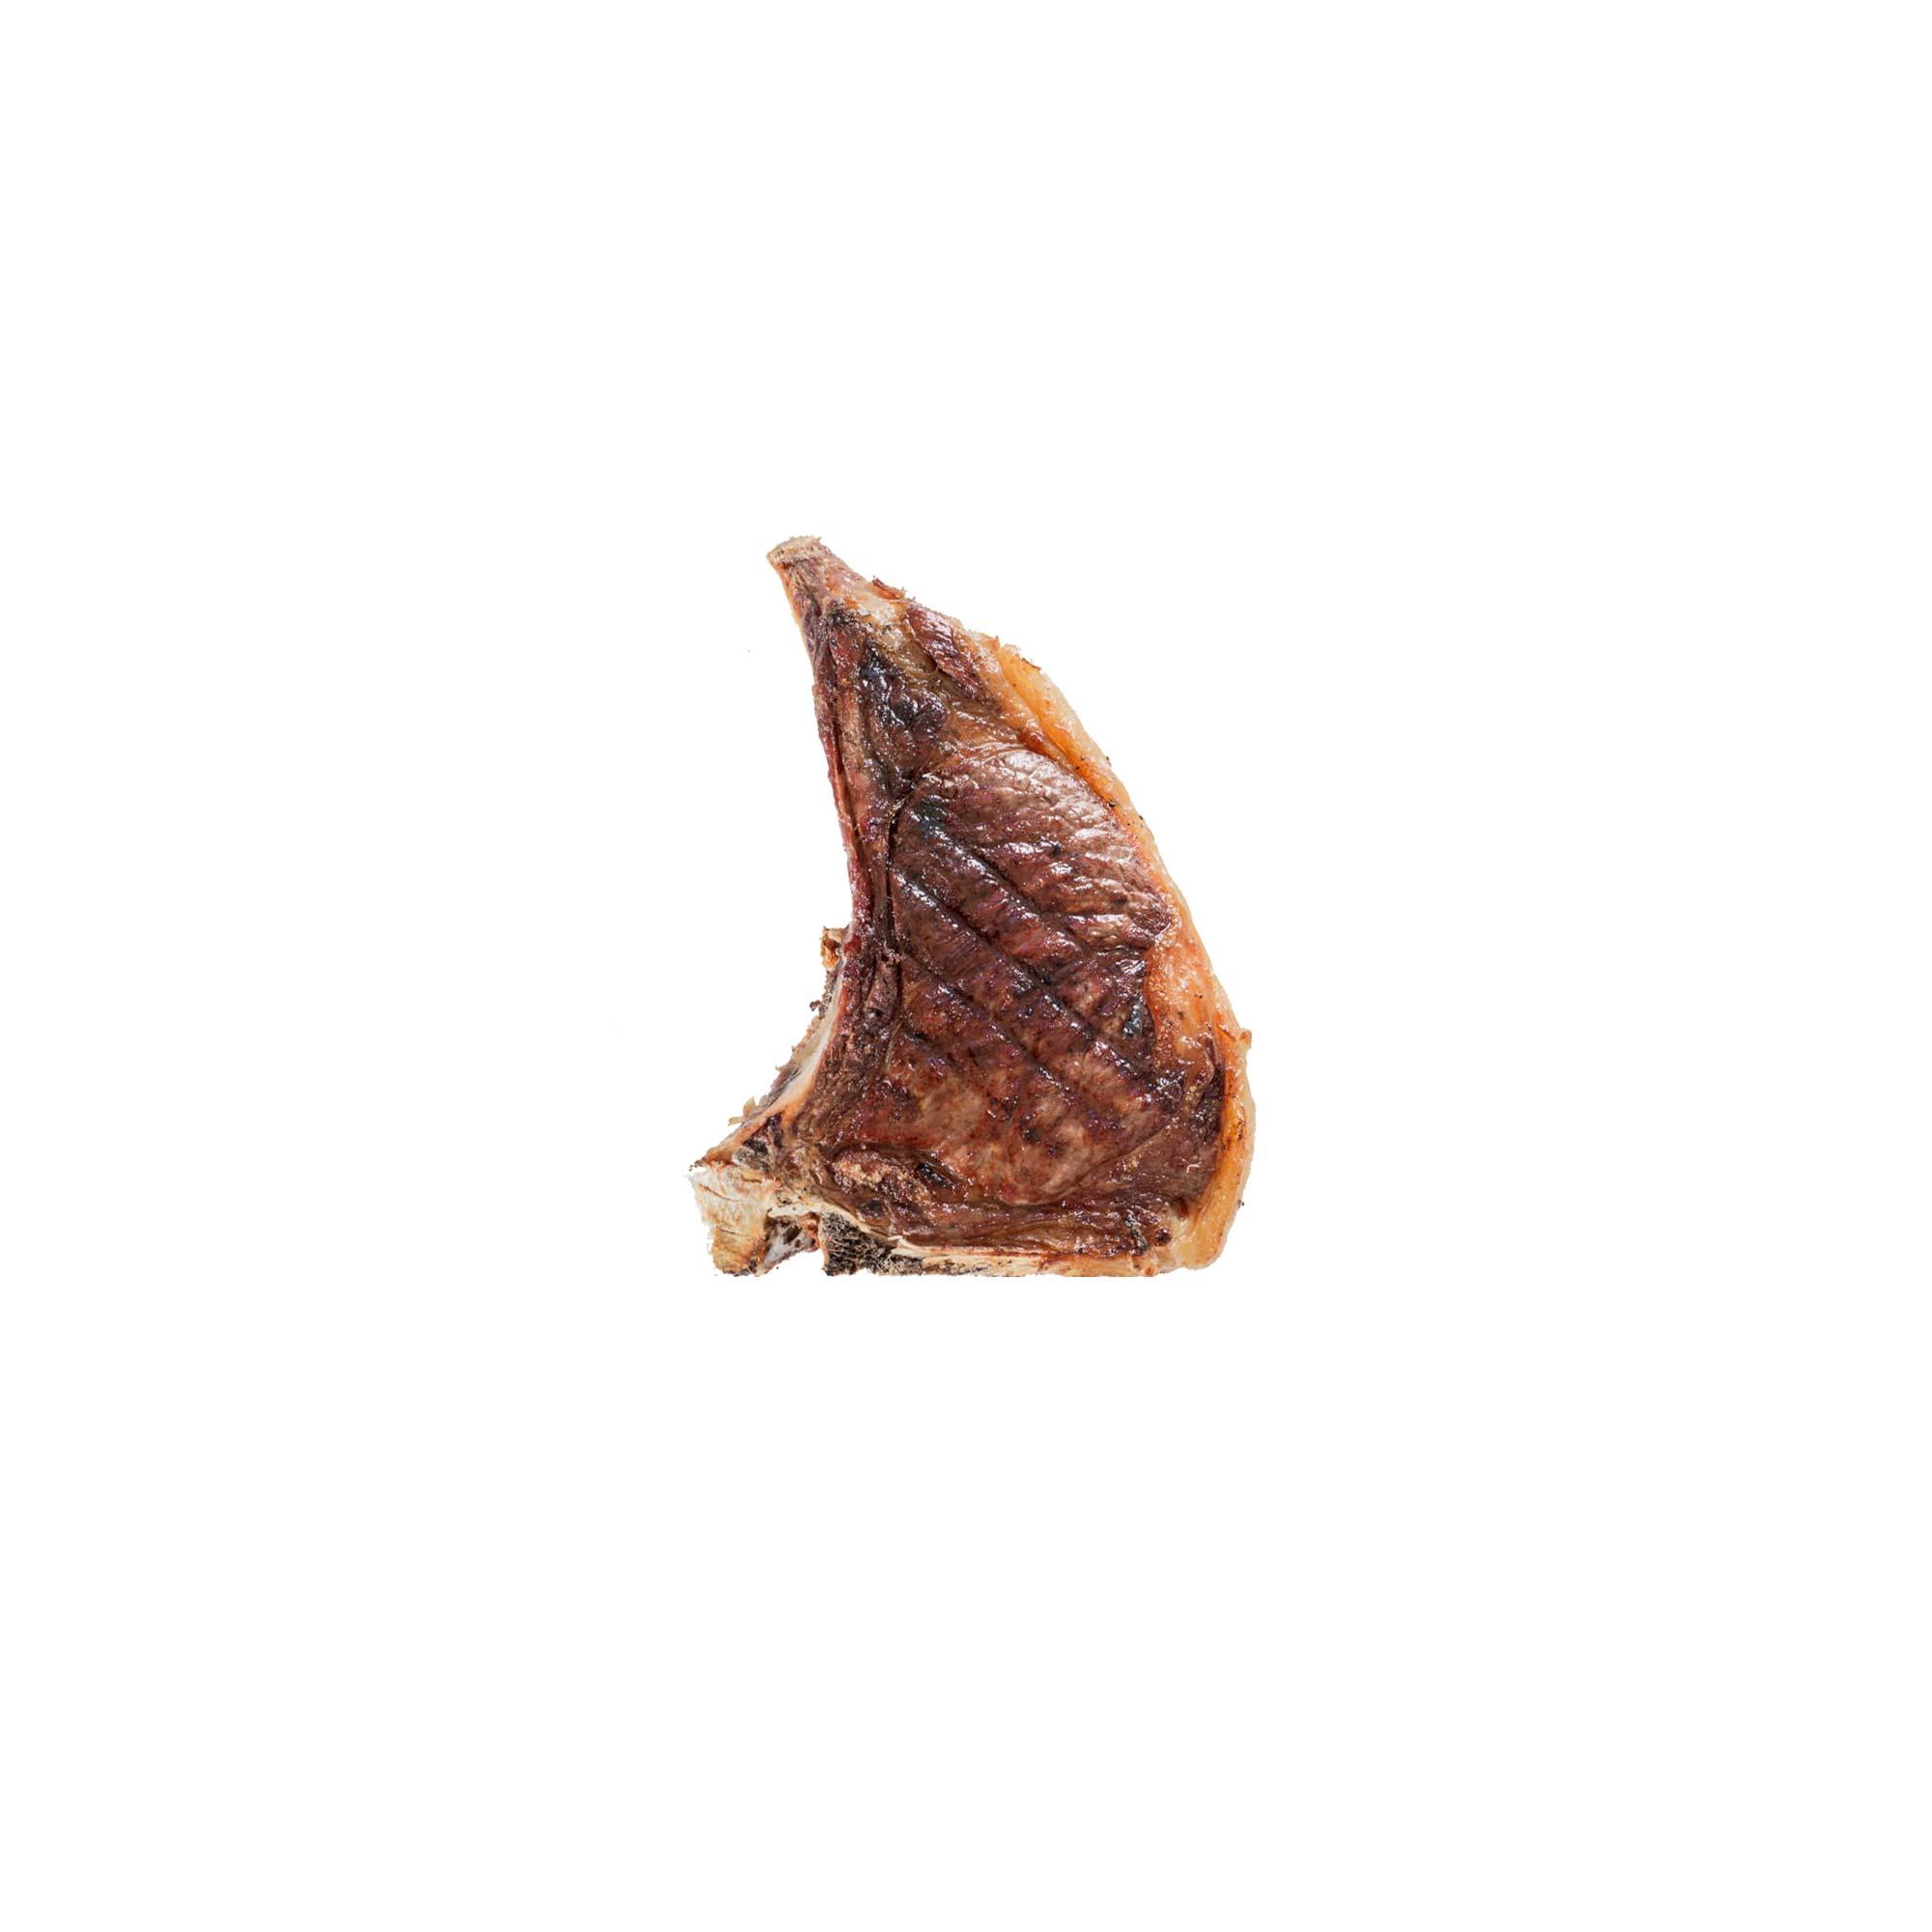 Steak Home - serravalle pistoiese - location - dry aging - bistecca - costata - frollatura - due,quattro settimane